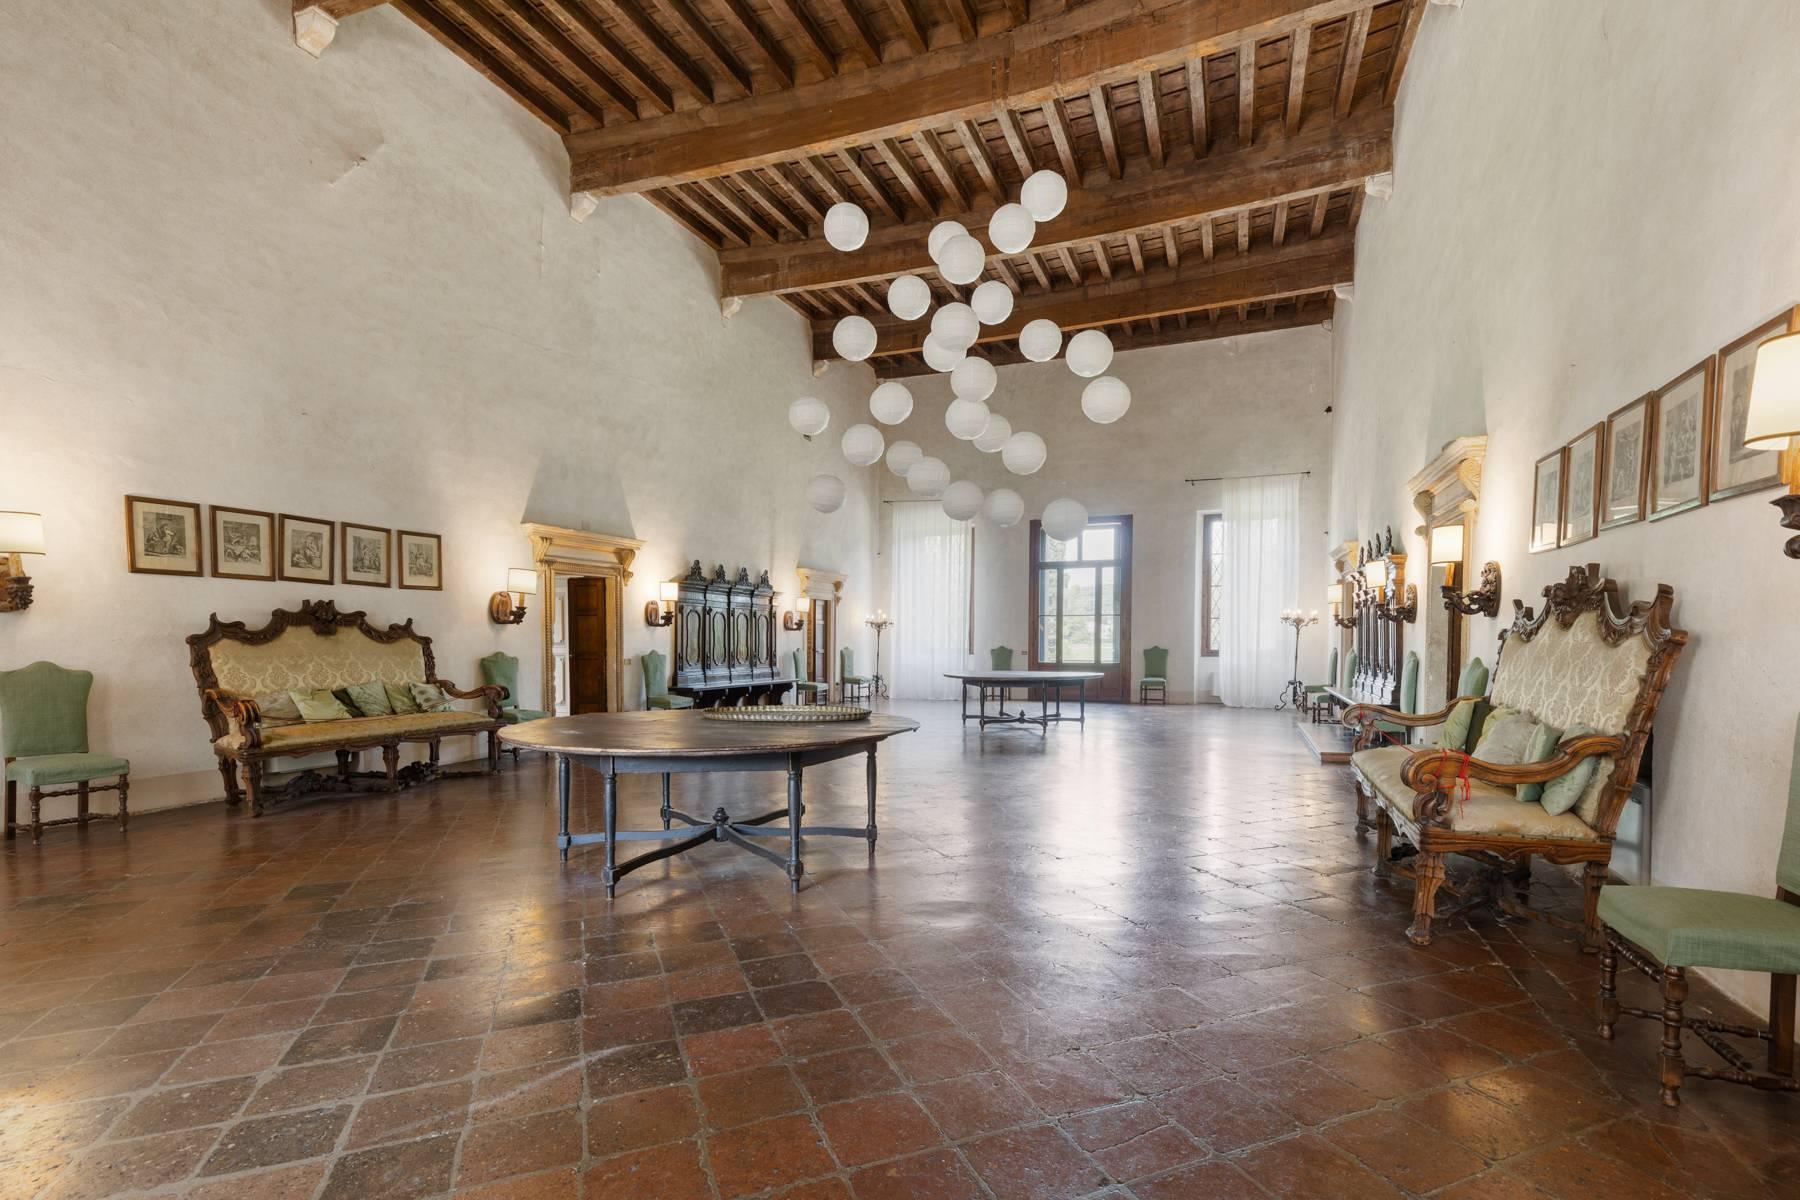 Villa in Vendita a Verona: 5 locali, 2400 mq - Foto 23